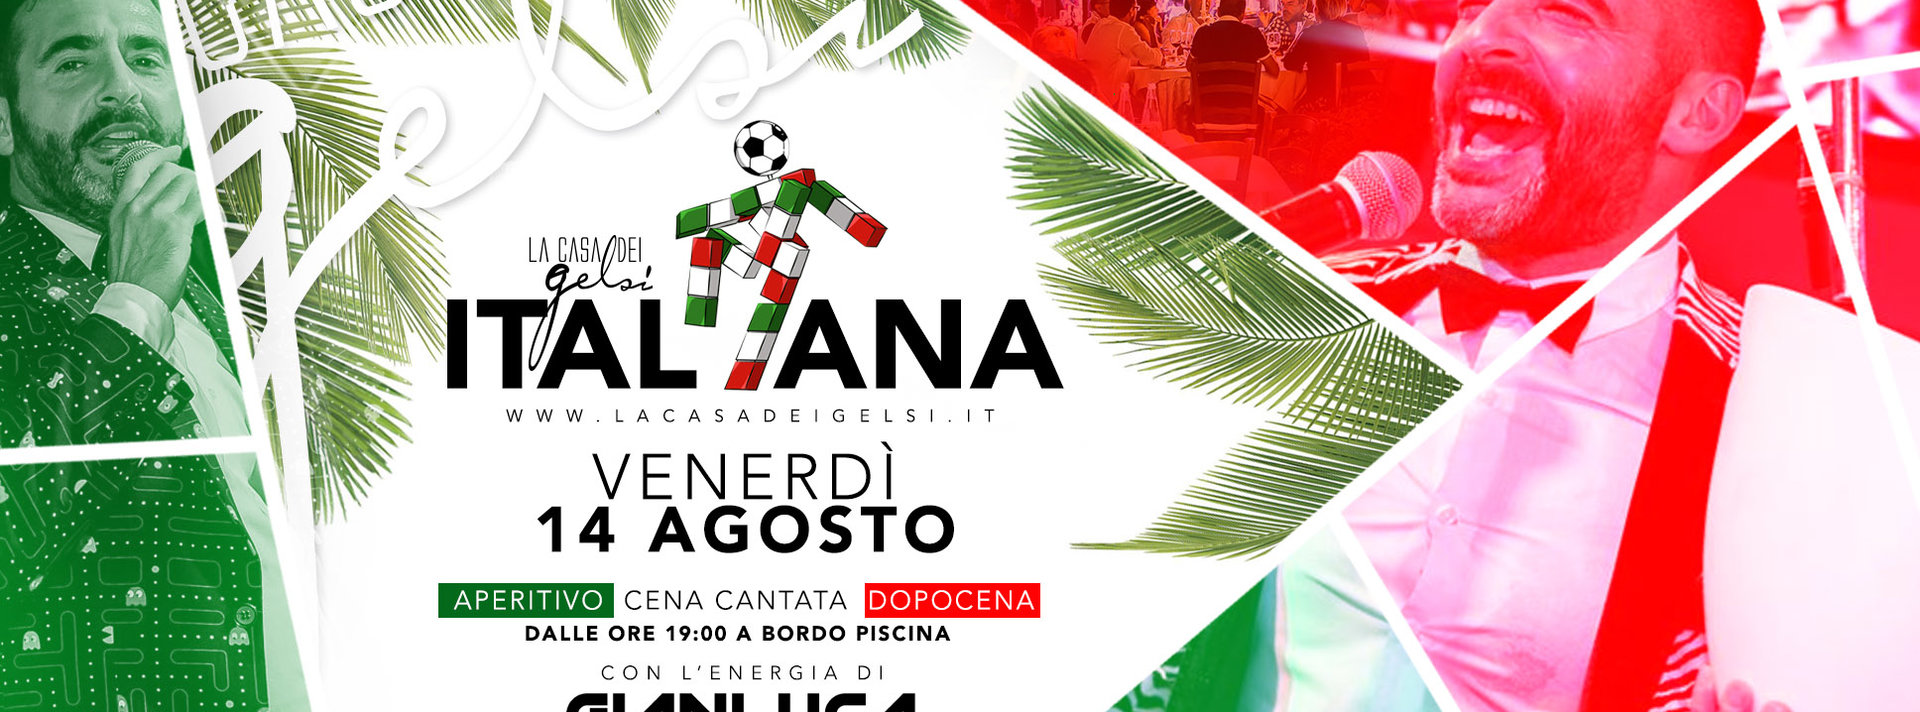 Italiana con Gianluca Indovino - 14 agosto 2020